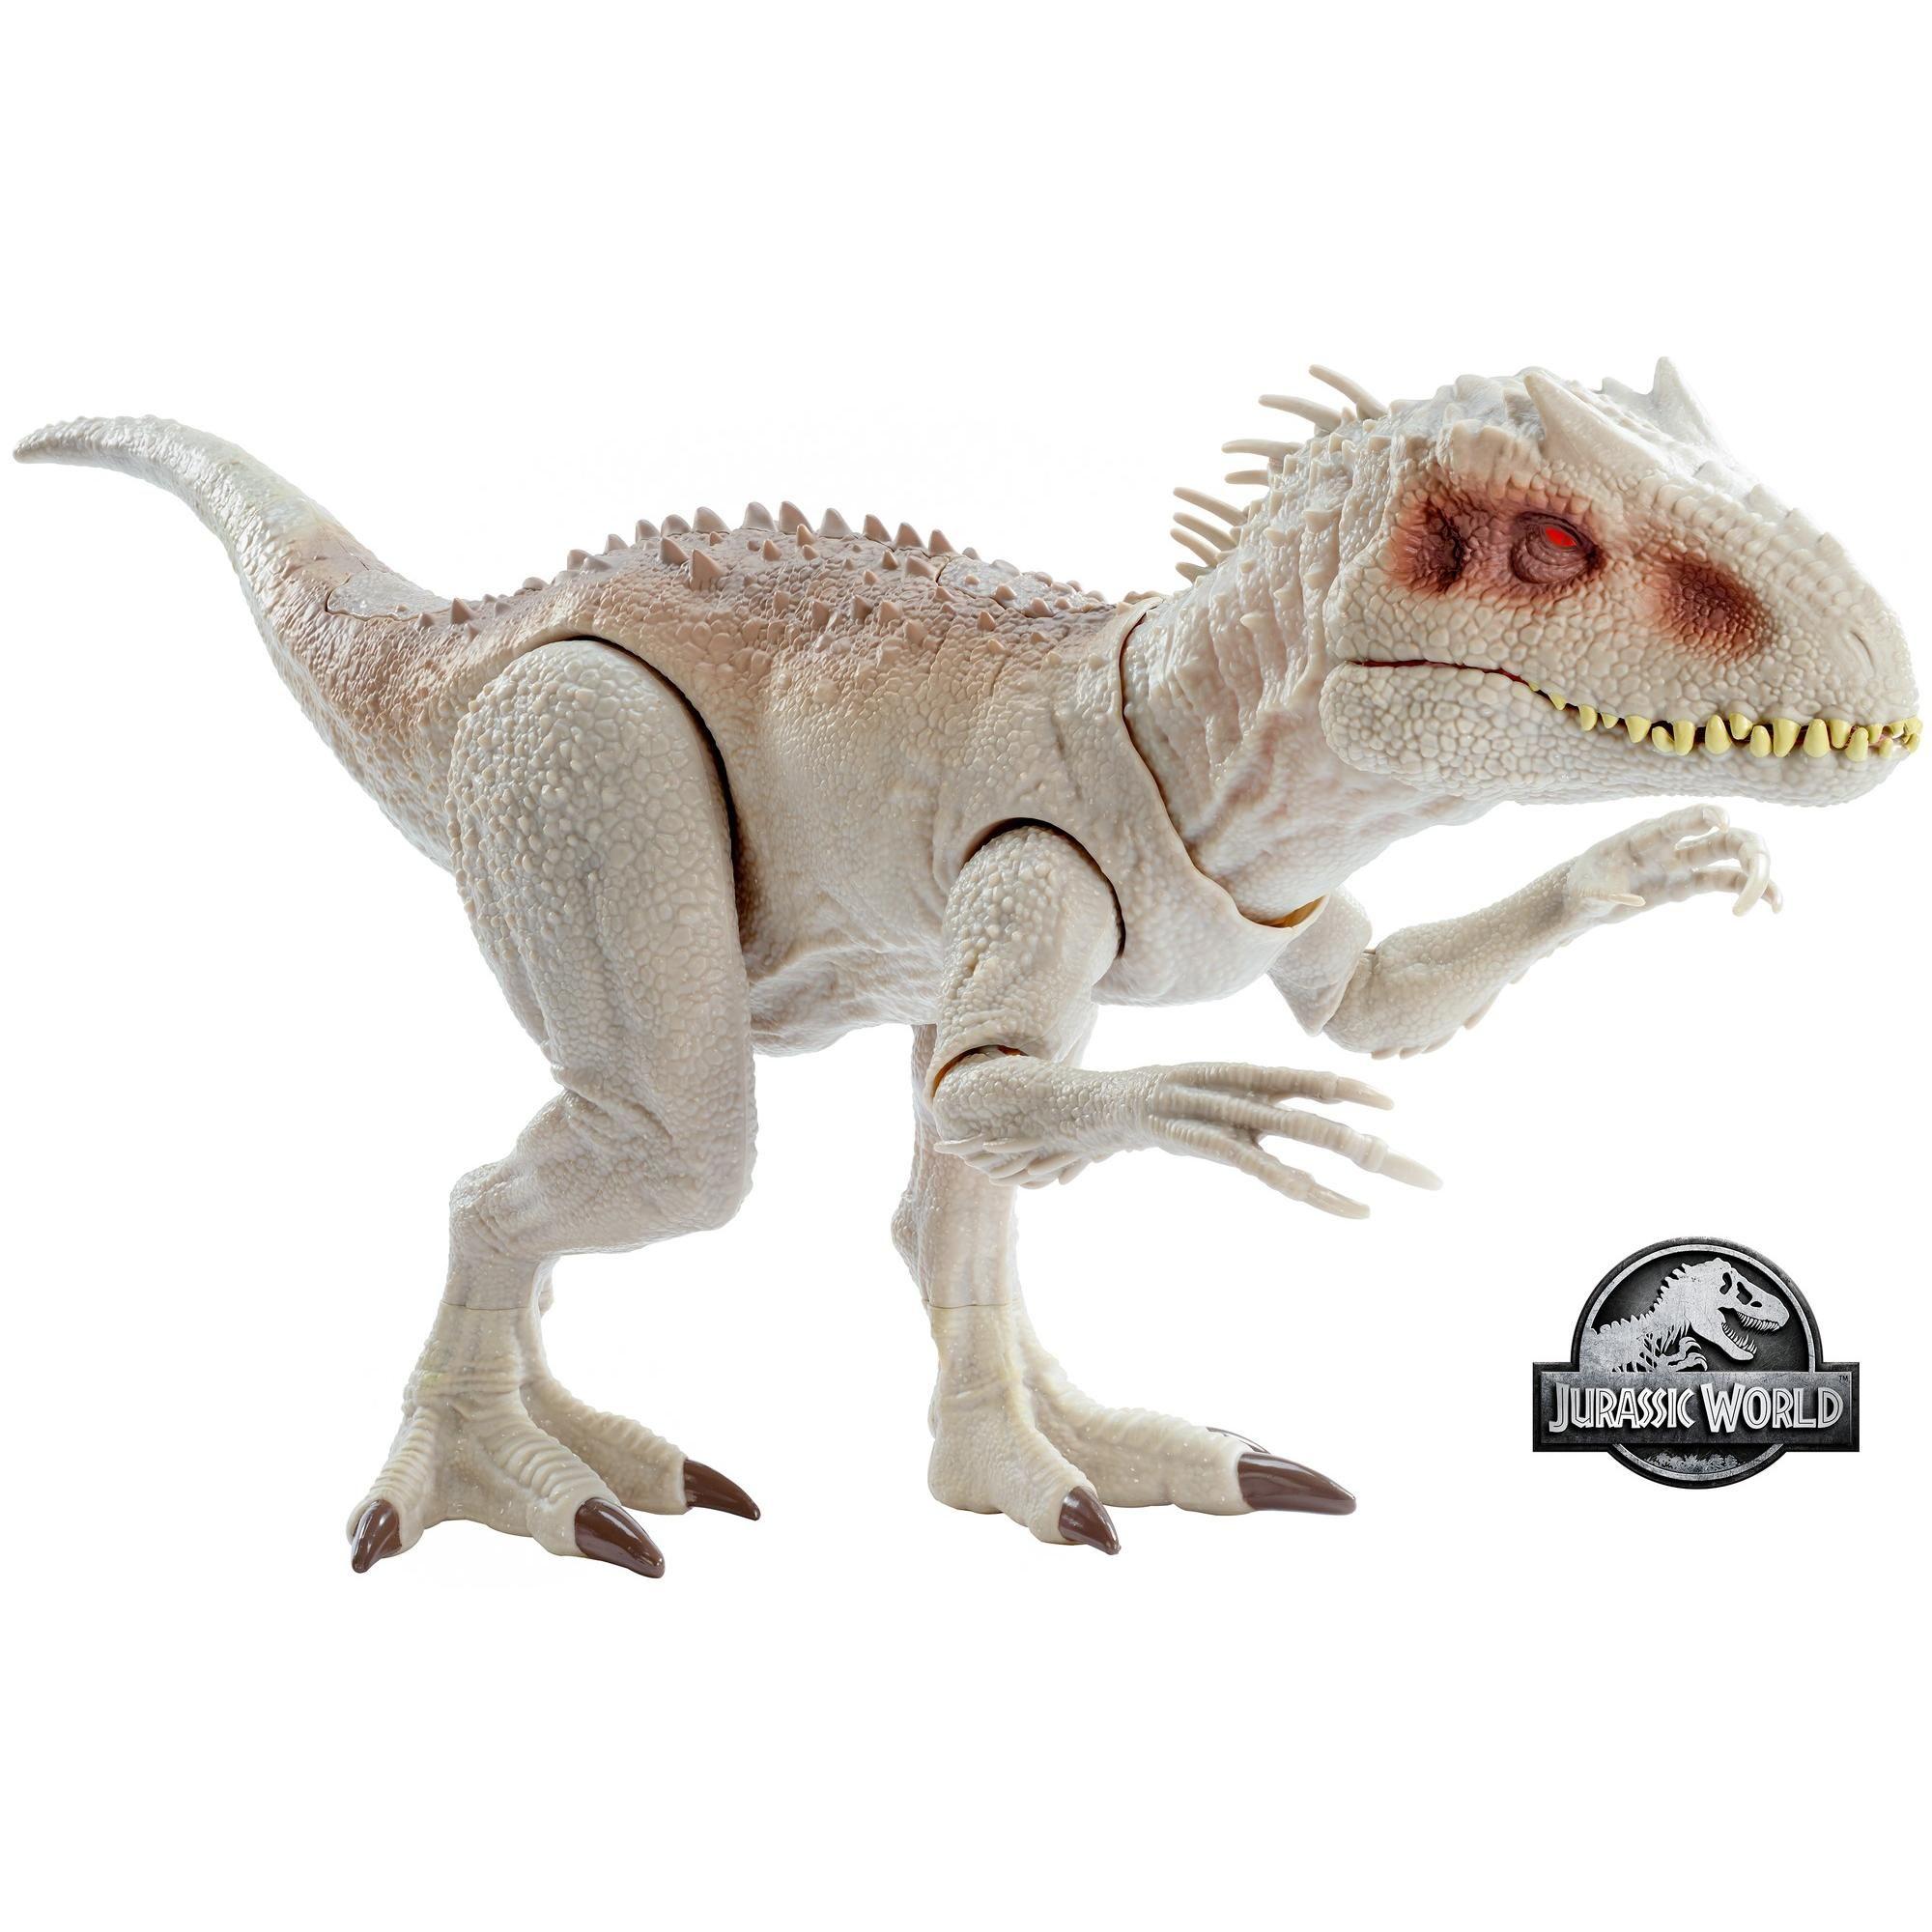 Toys Jurassic world, Indominus rex, Dinosaur toys